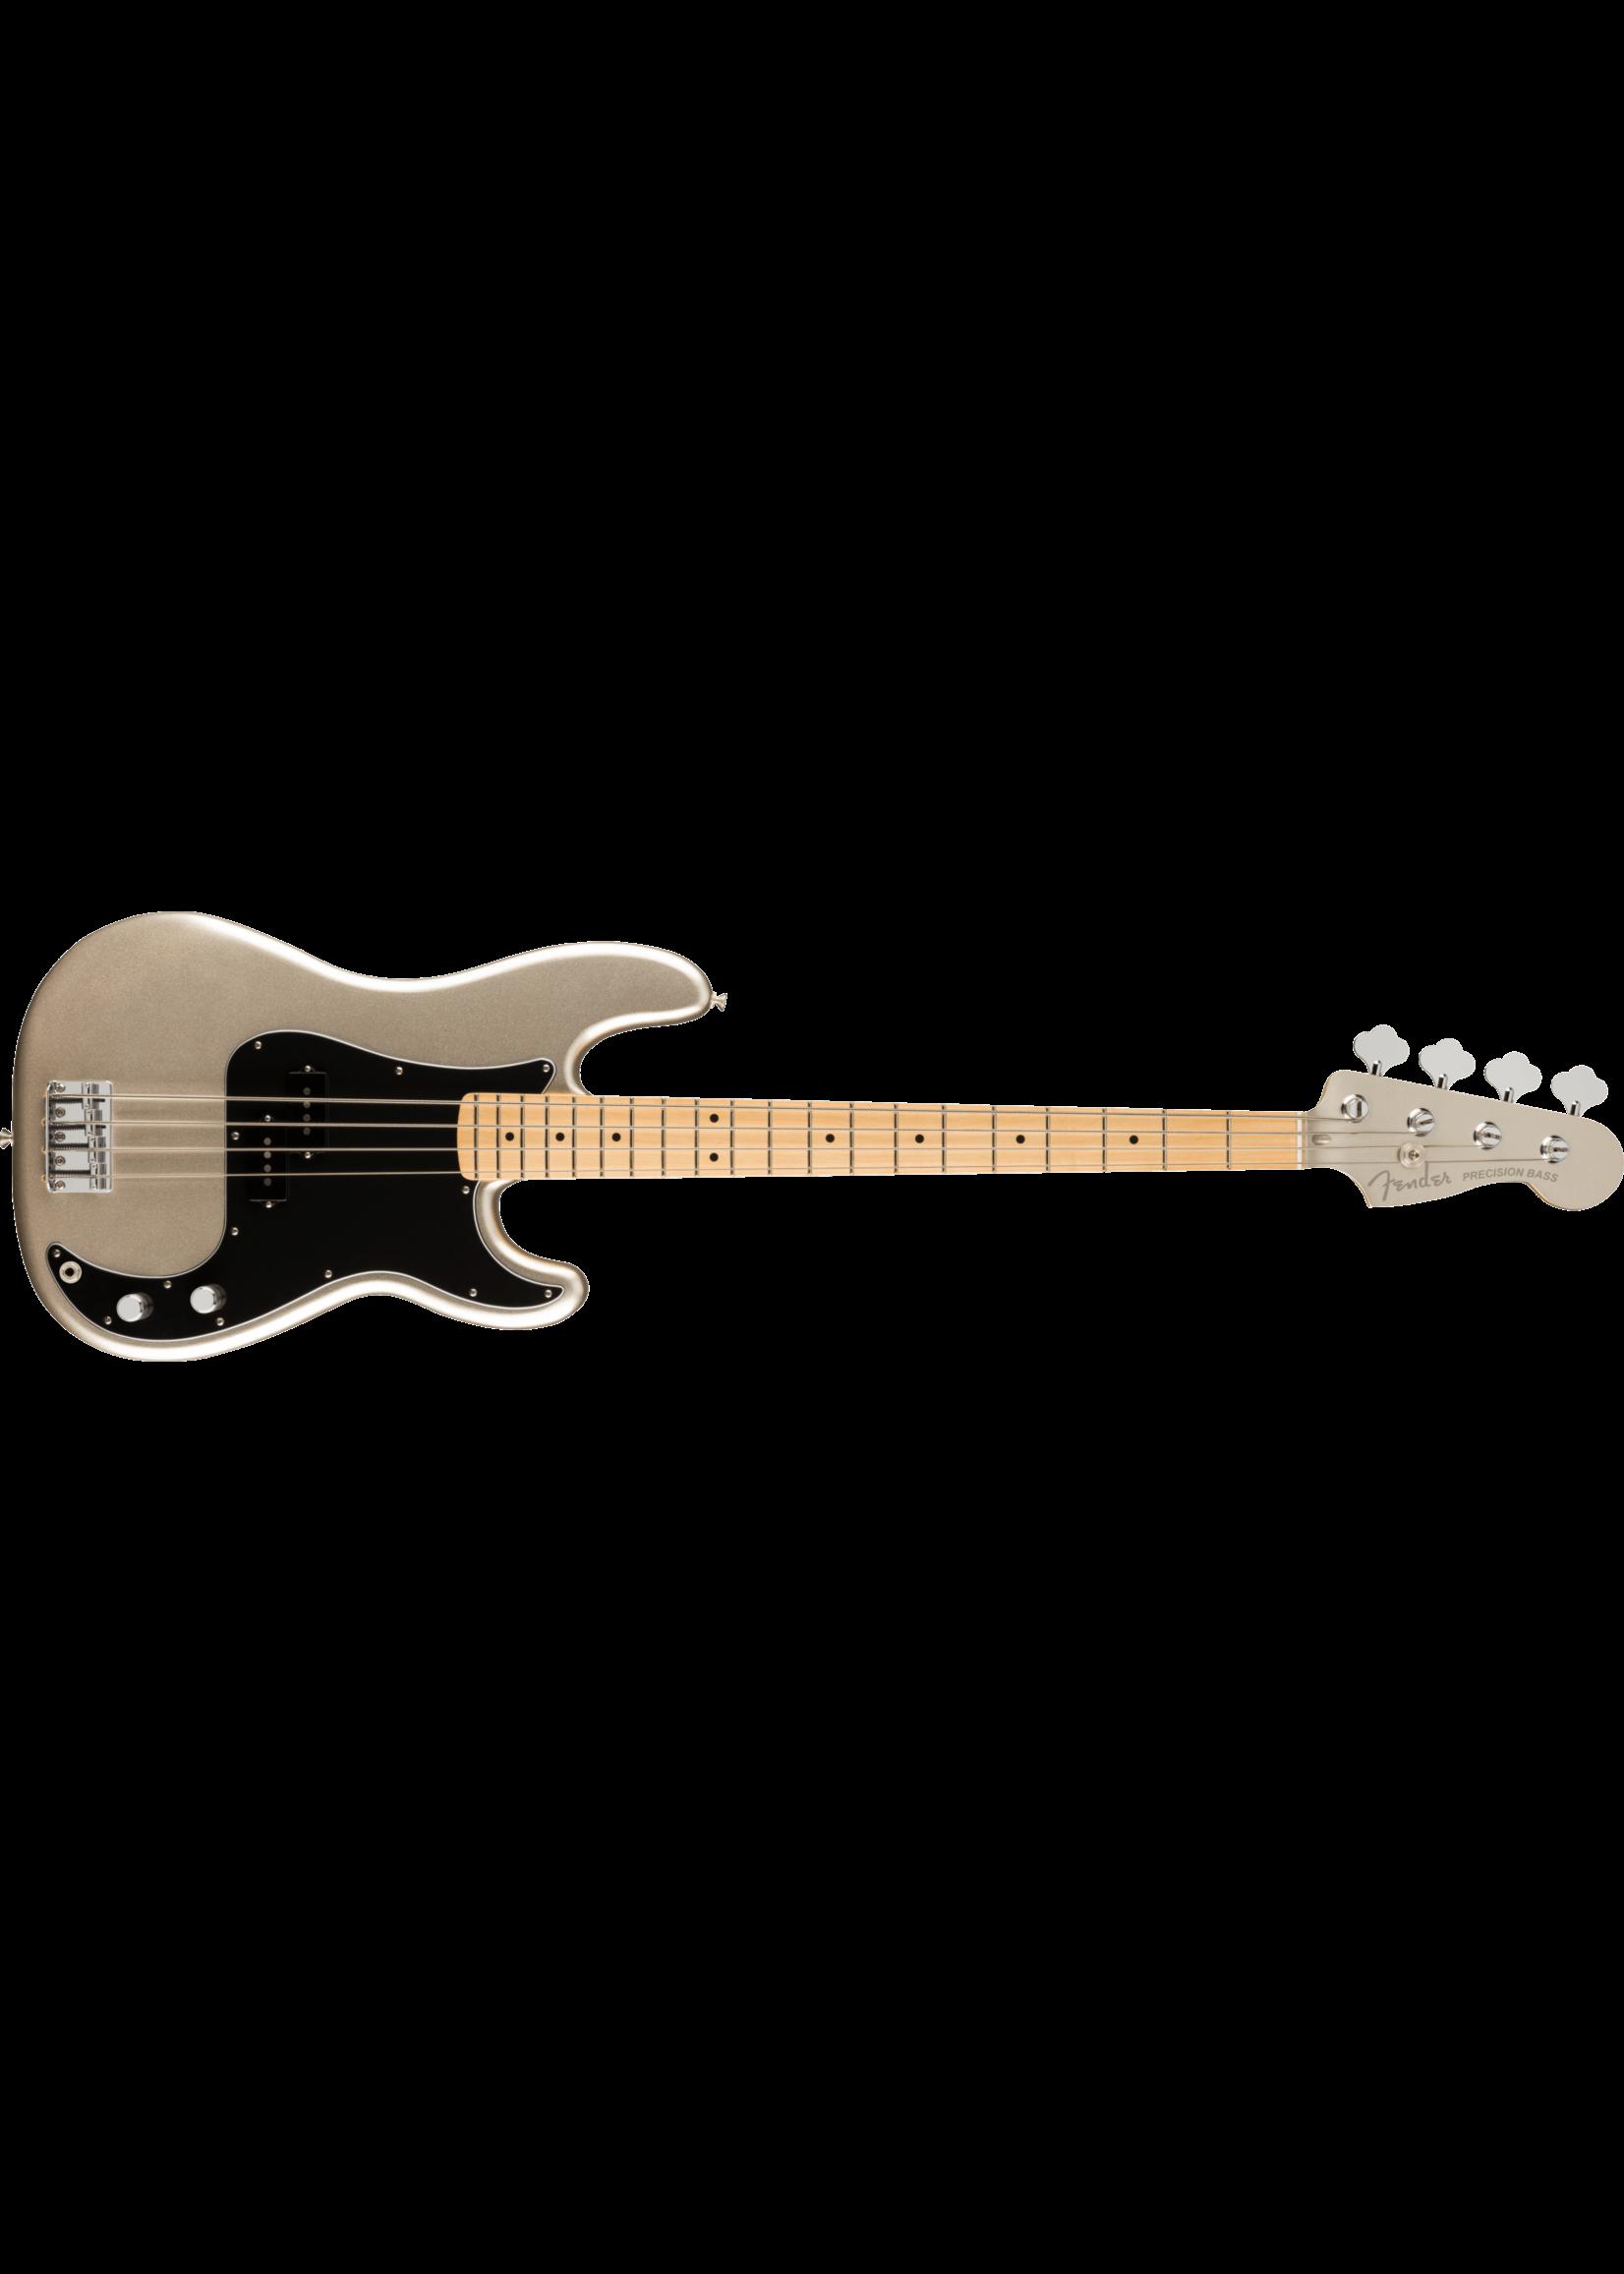 Fender Fender 75th Anniversary Precision Bass Diamond Anniversary